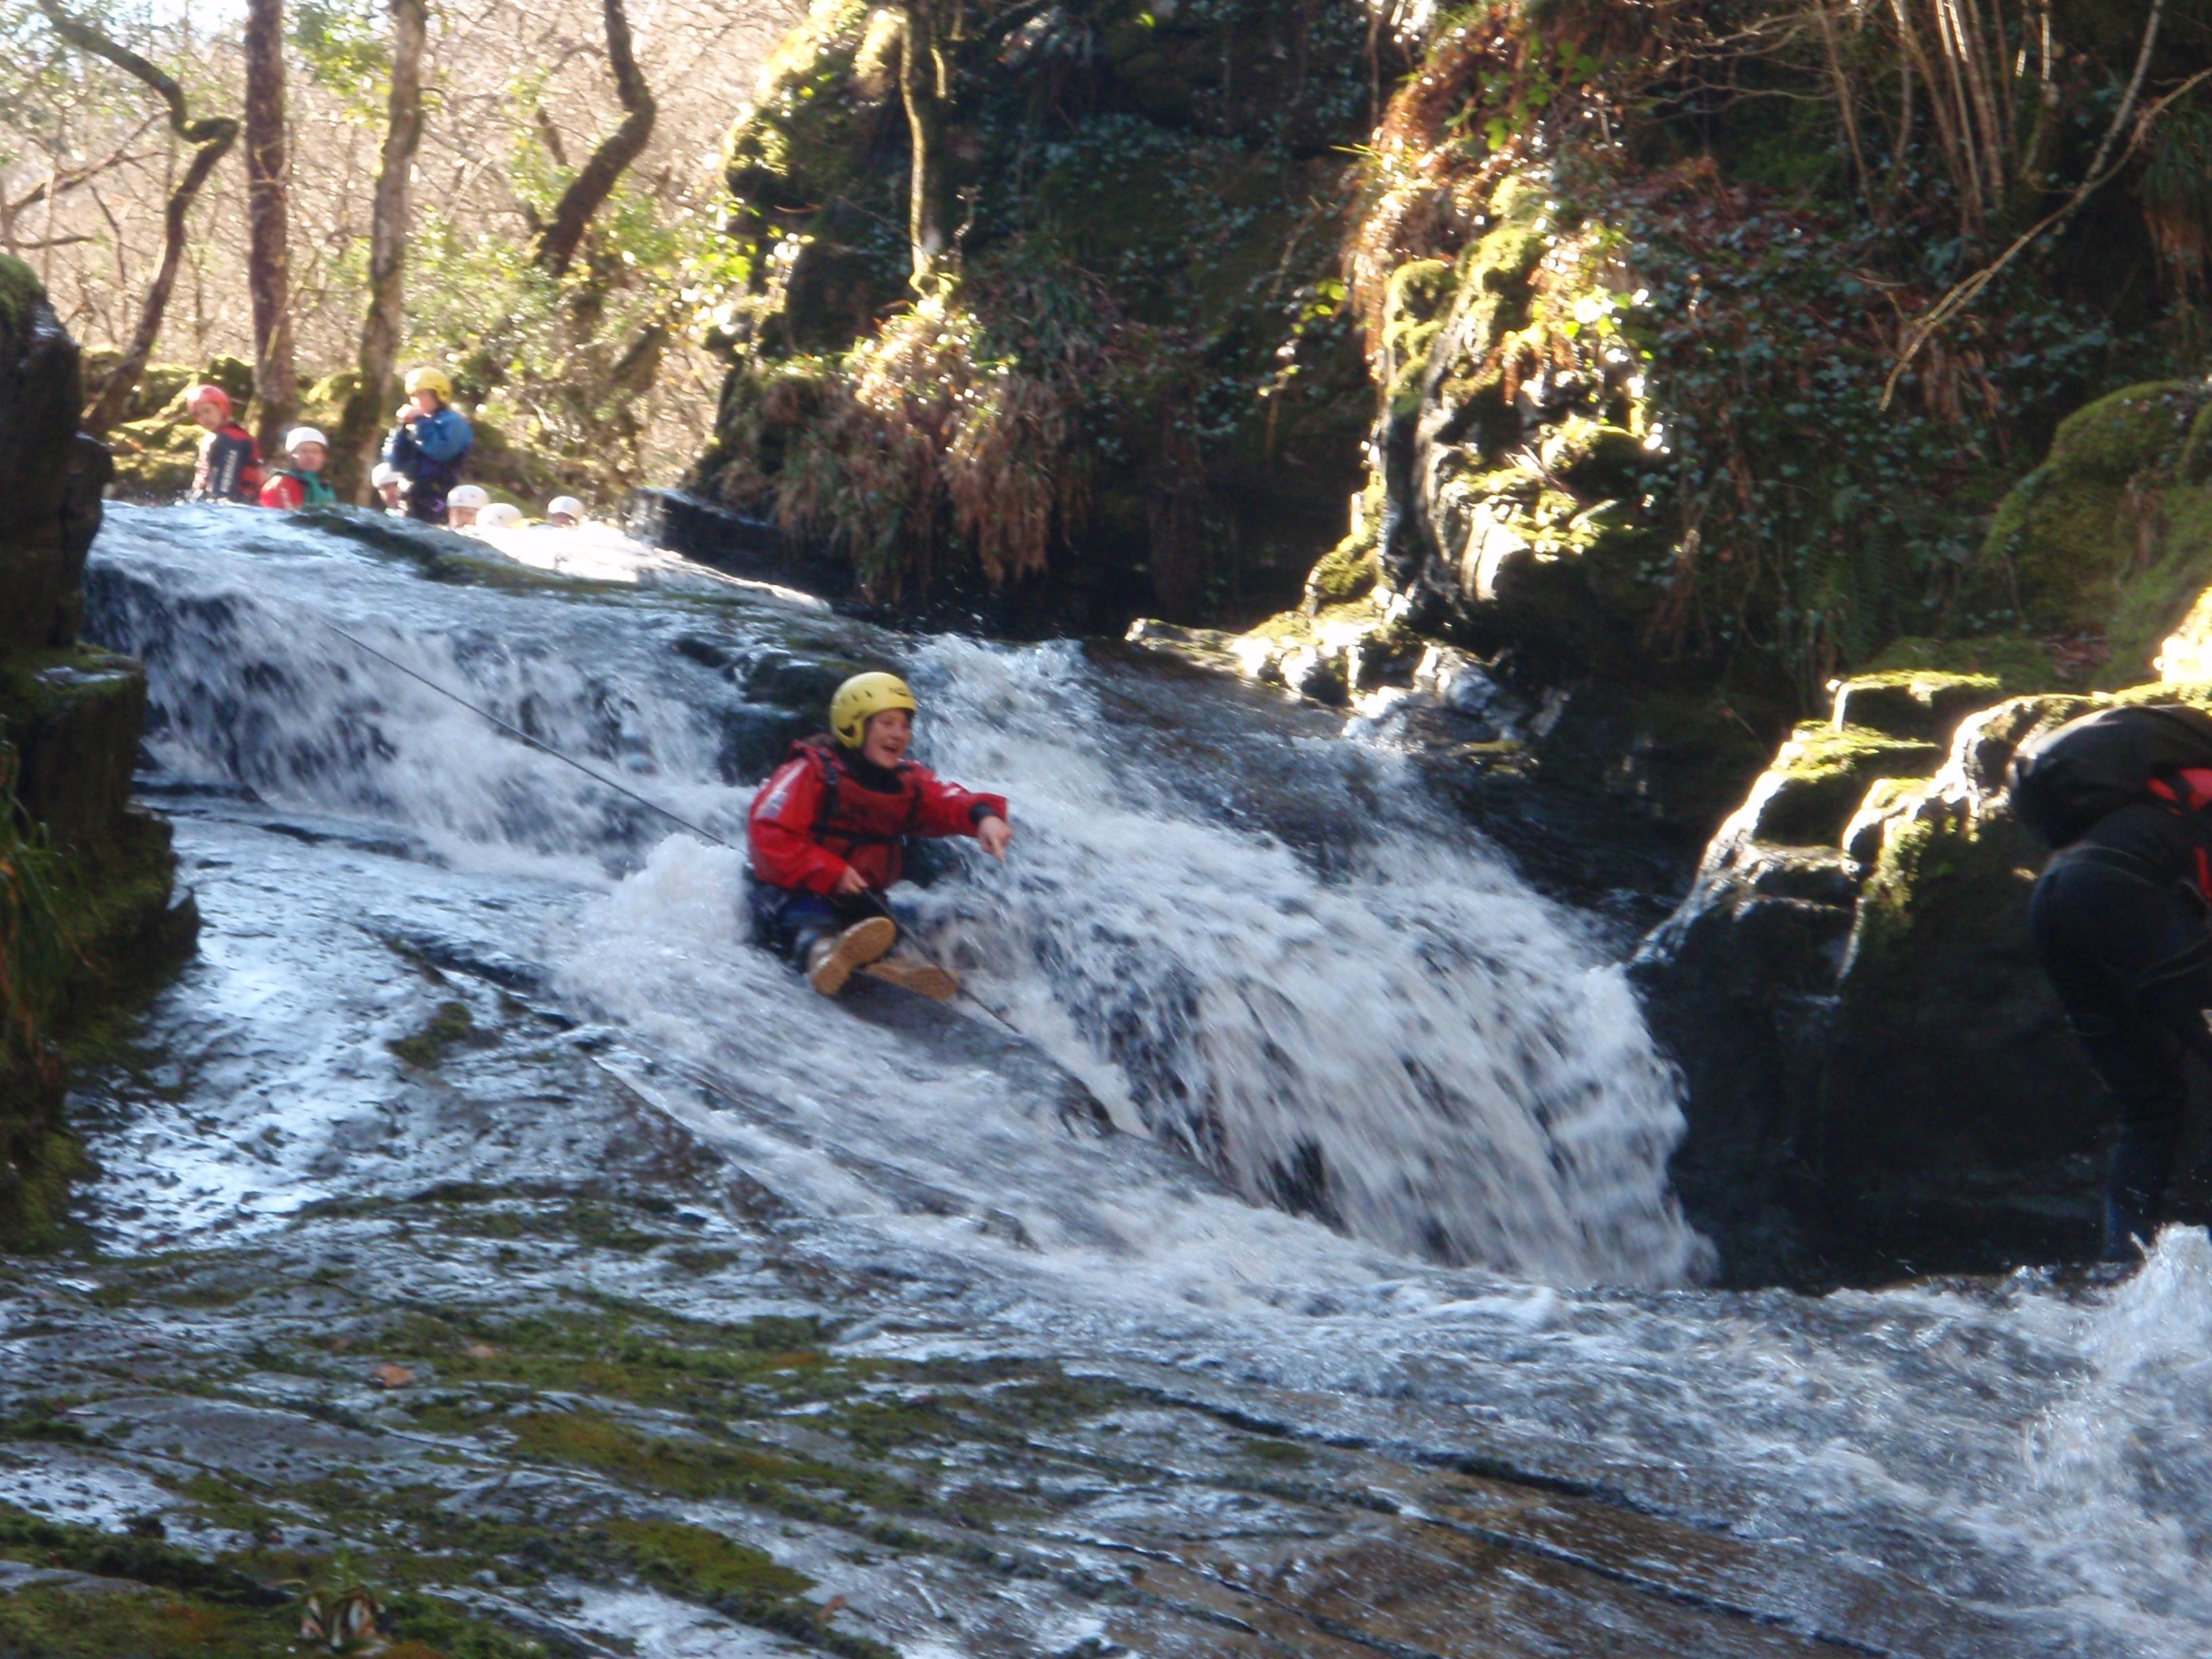 Gorge Walking School Activity Trips Adventure Holidays